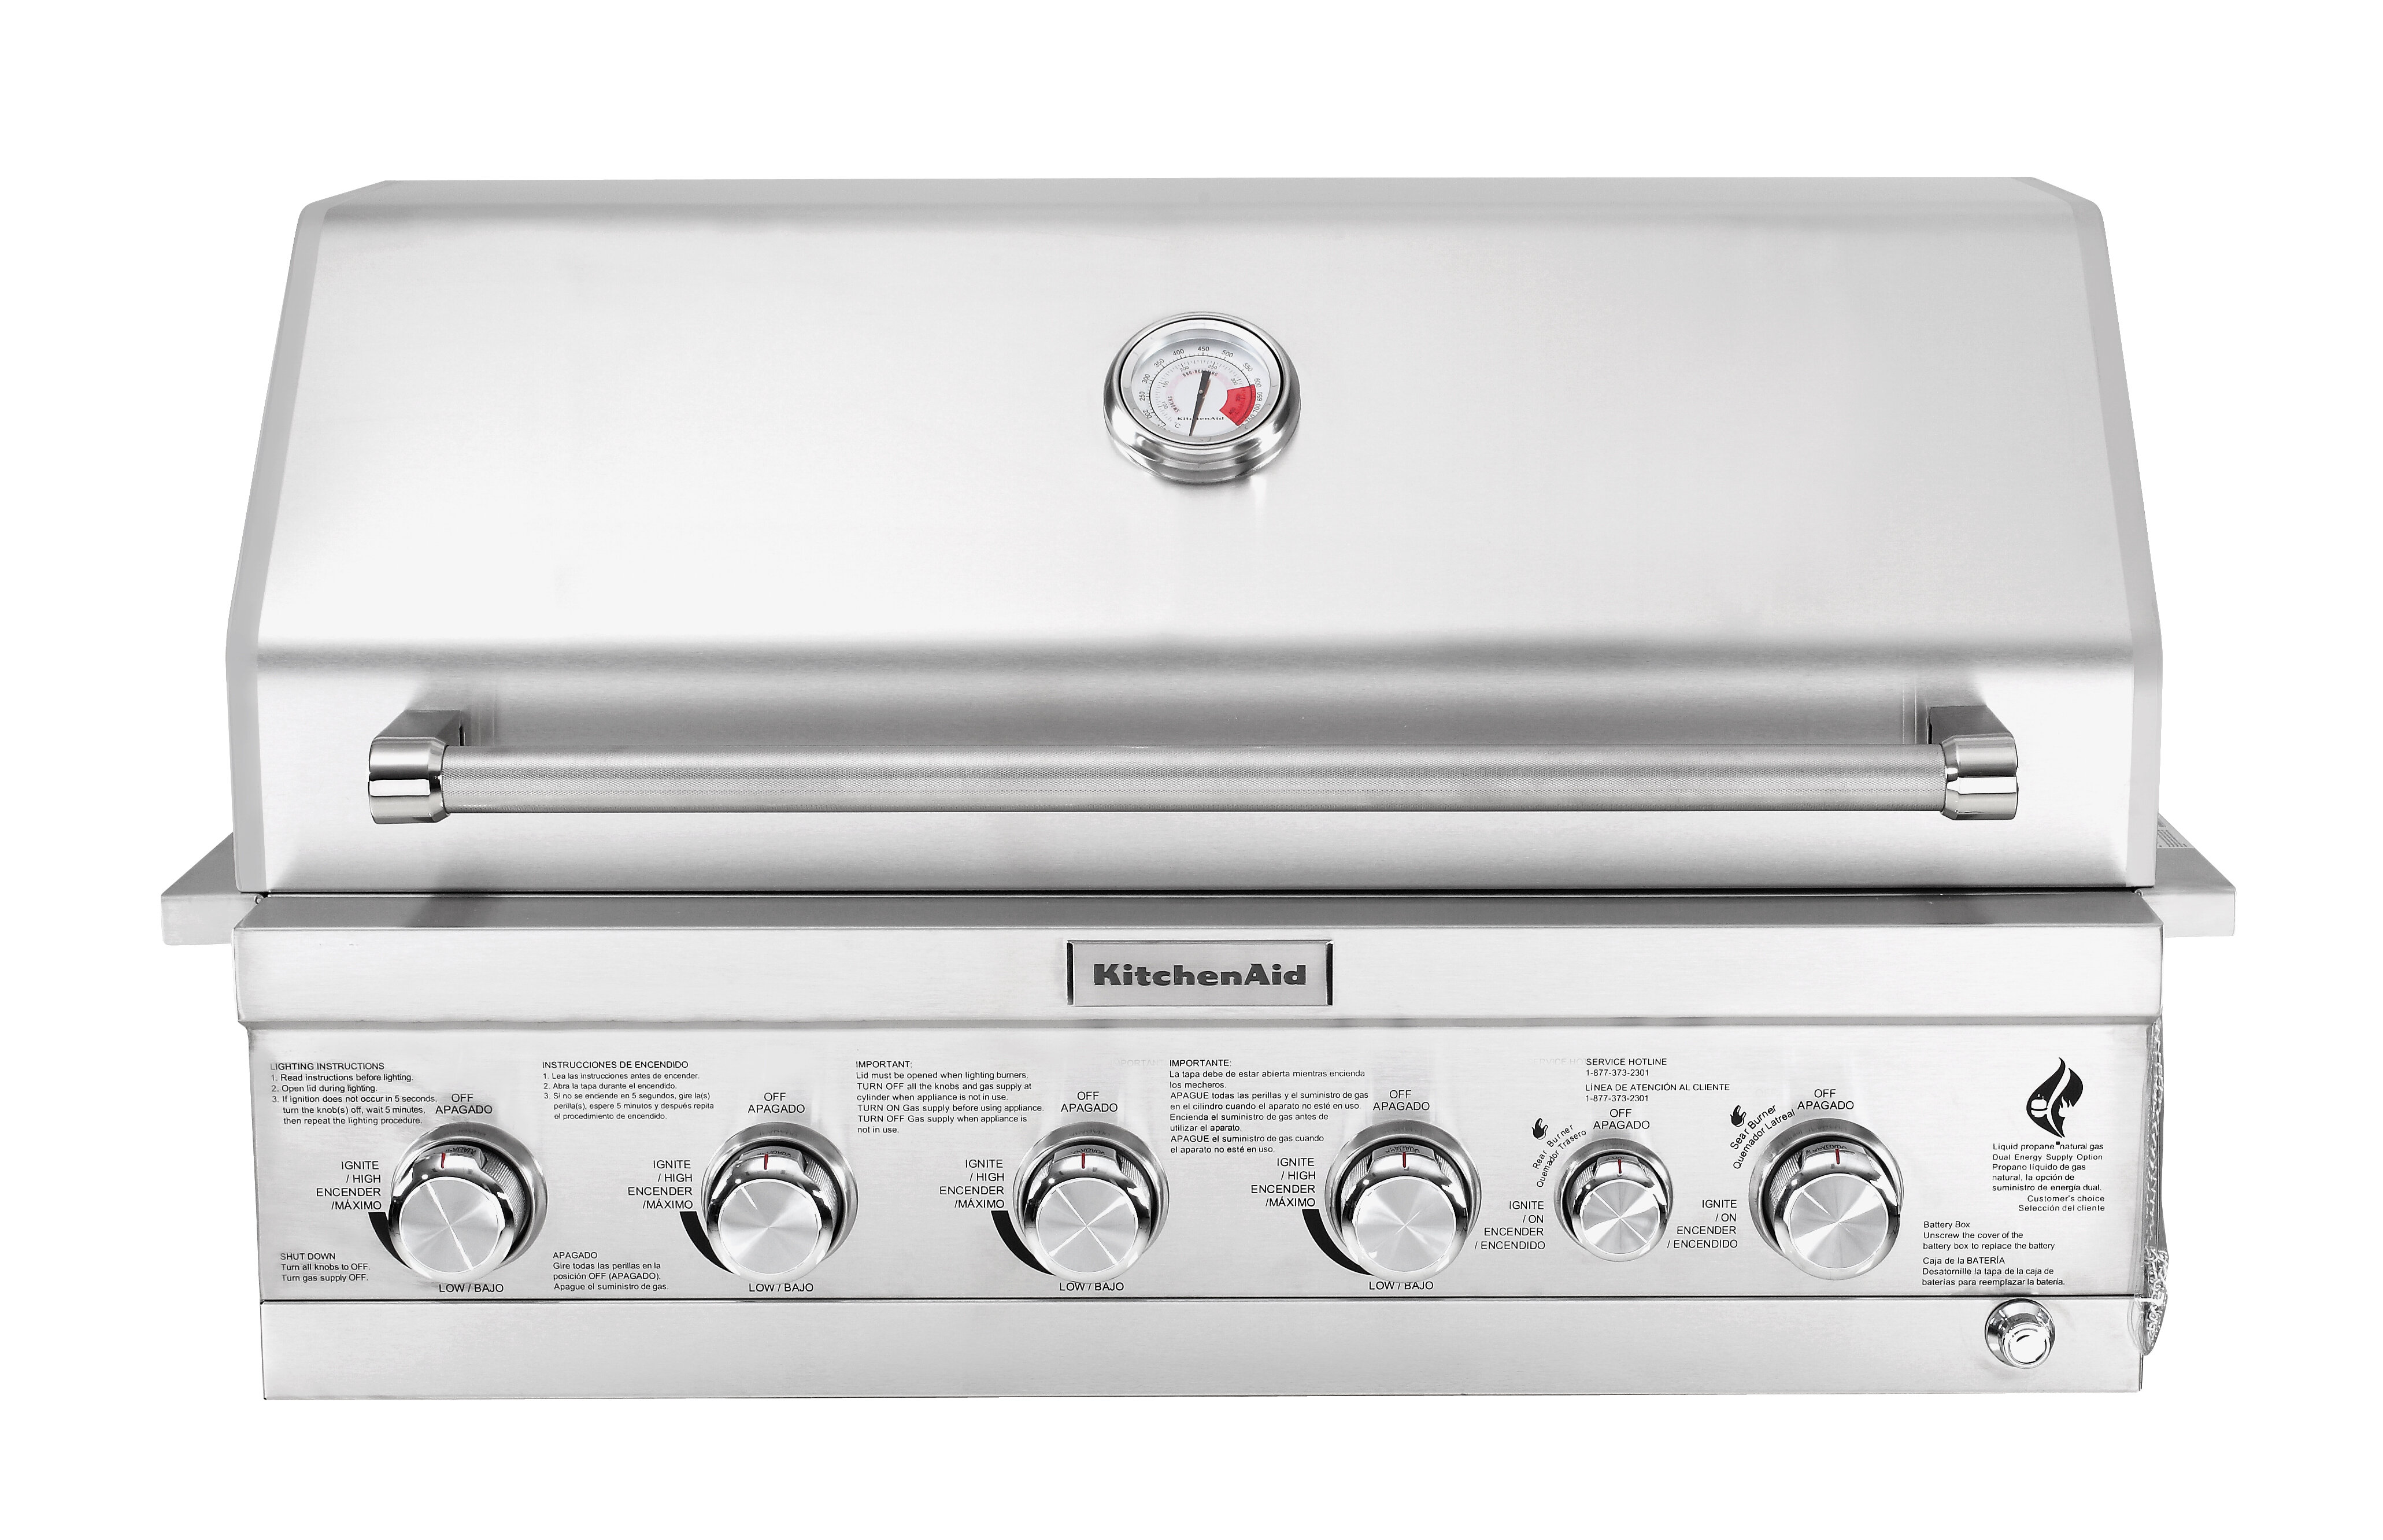 KitchenAid 4-Burner Built-In Liquid Propane Gas Grill - 740